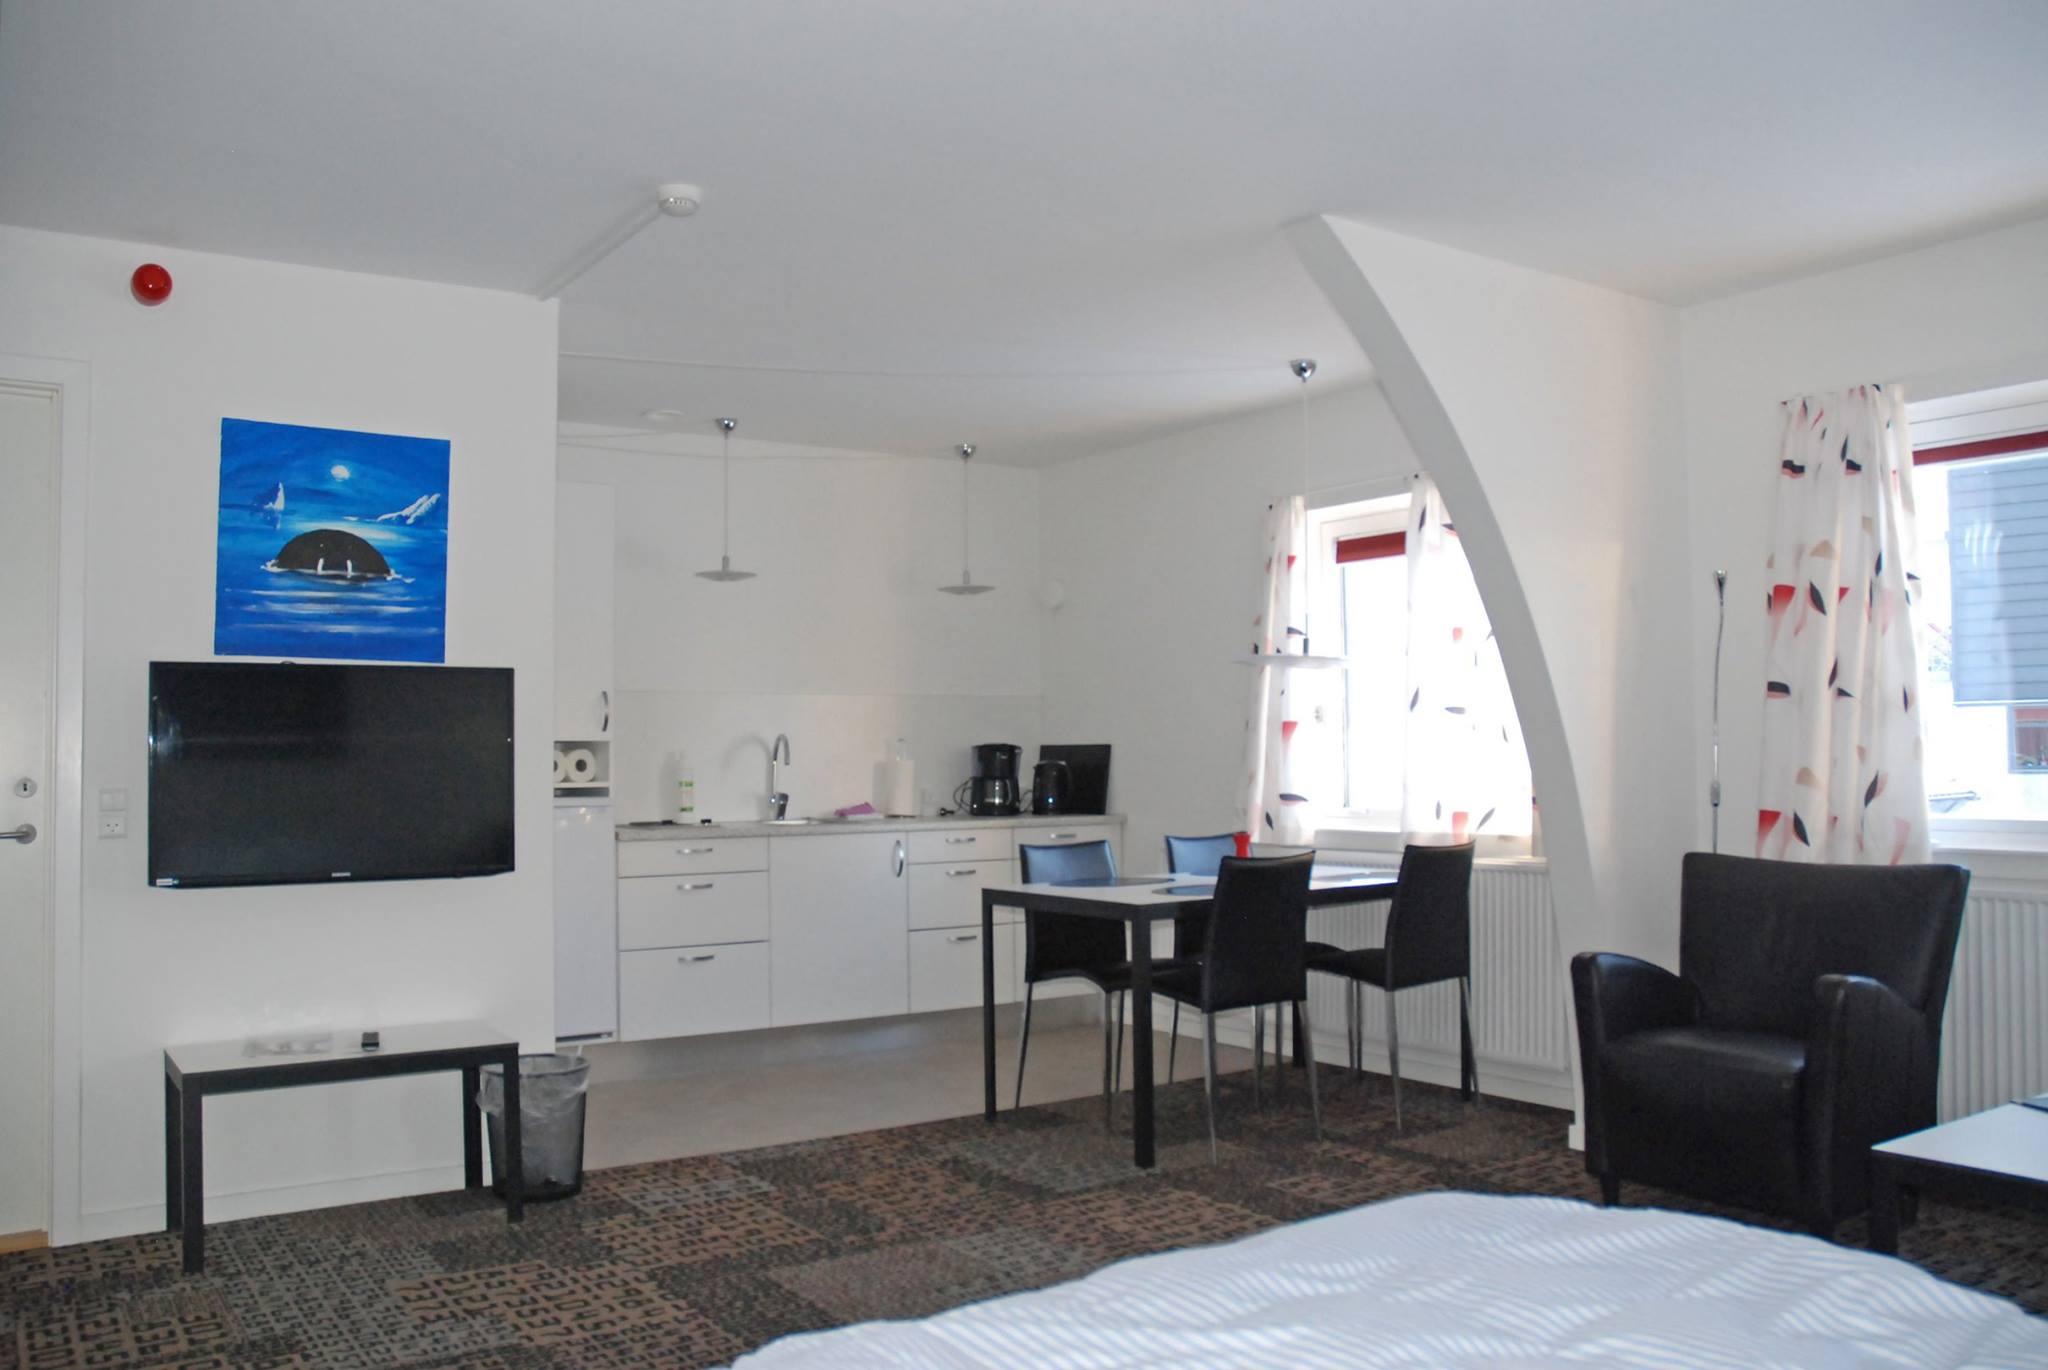 Hotel Nordbo Apartments - Nuuk Informative